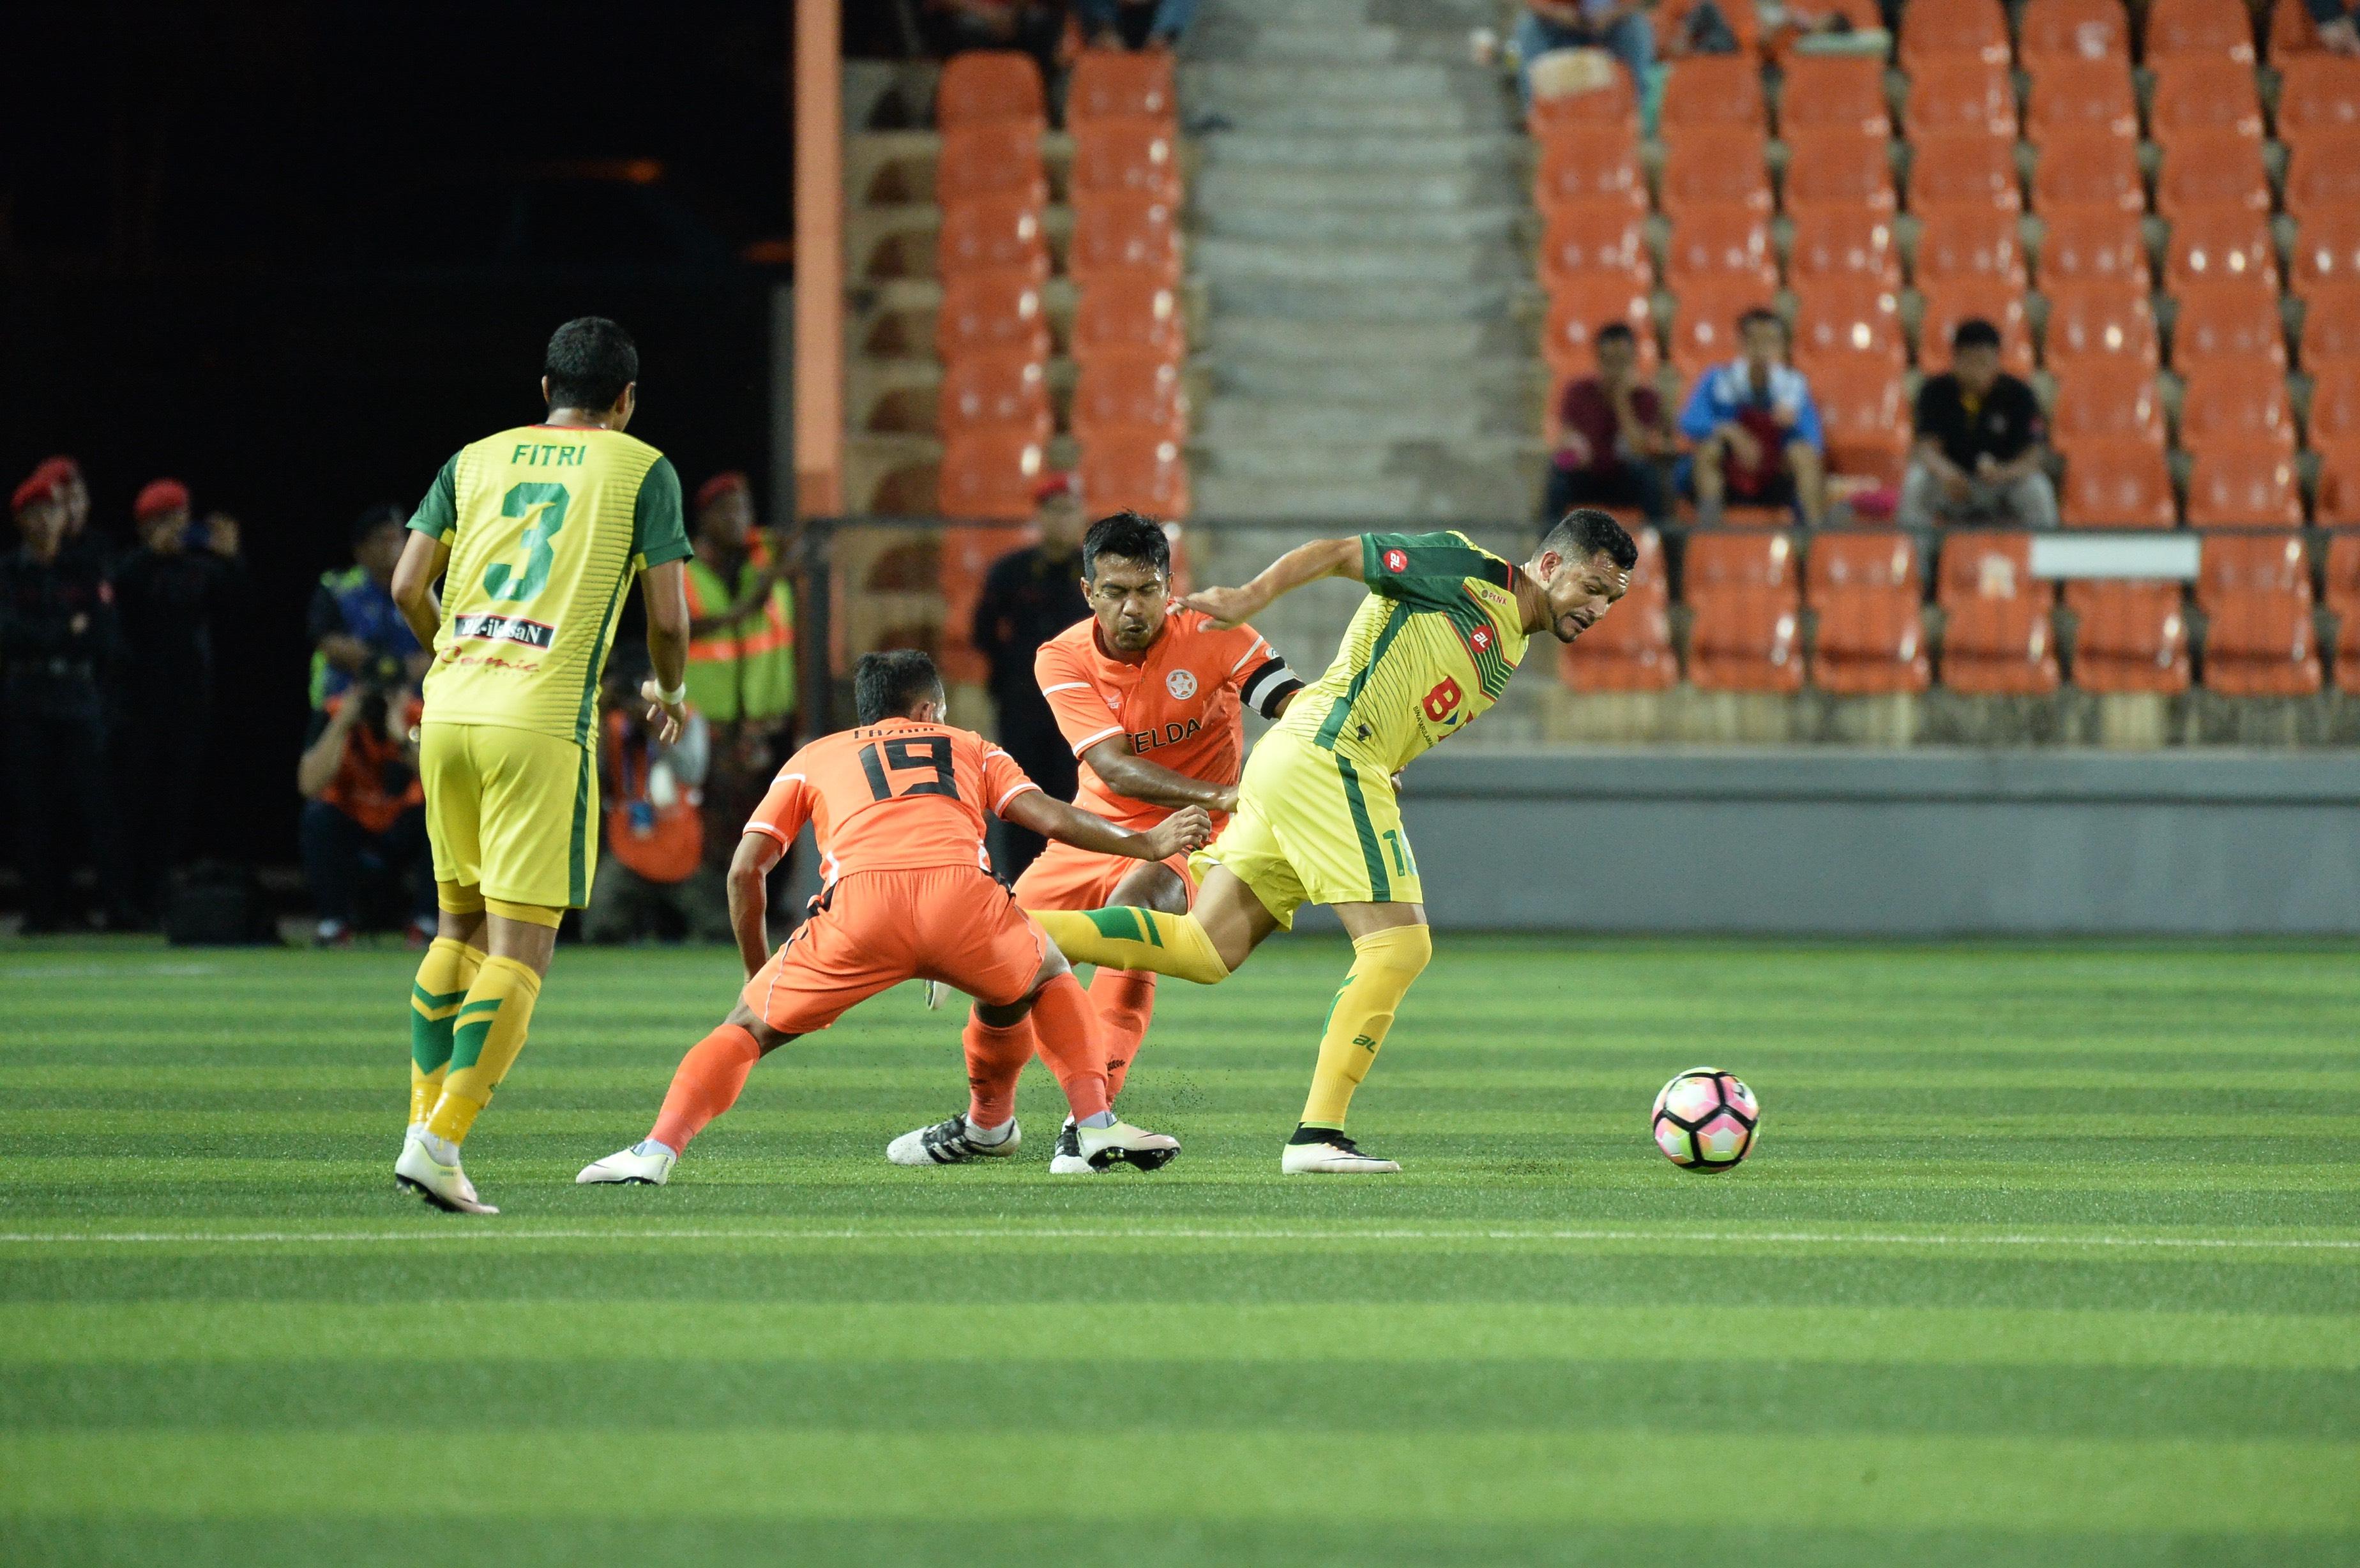 Shukor Adan Sandro da Silva Felda United Kedah Super League 4/2/17